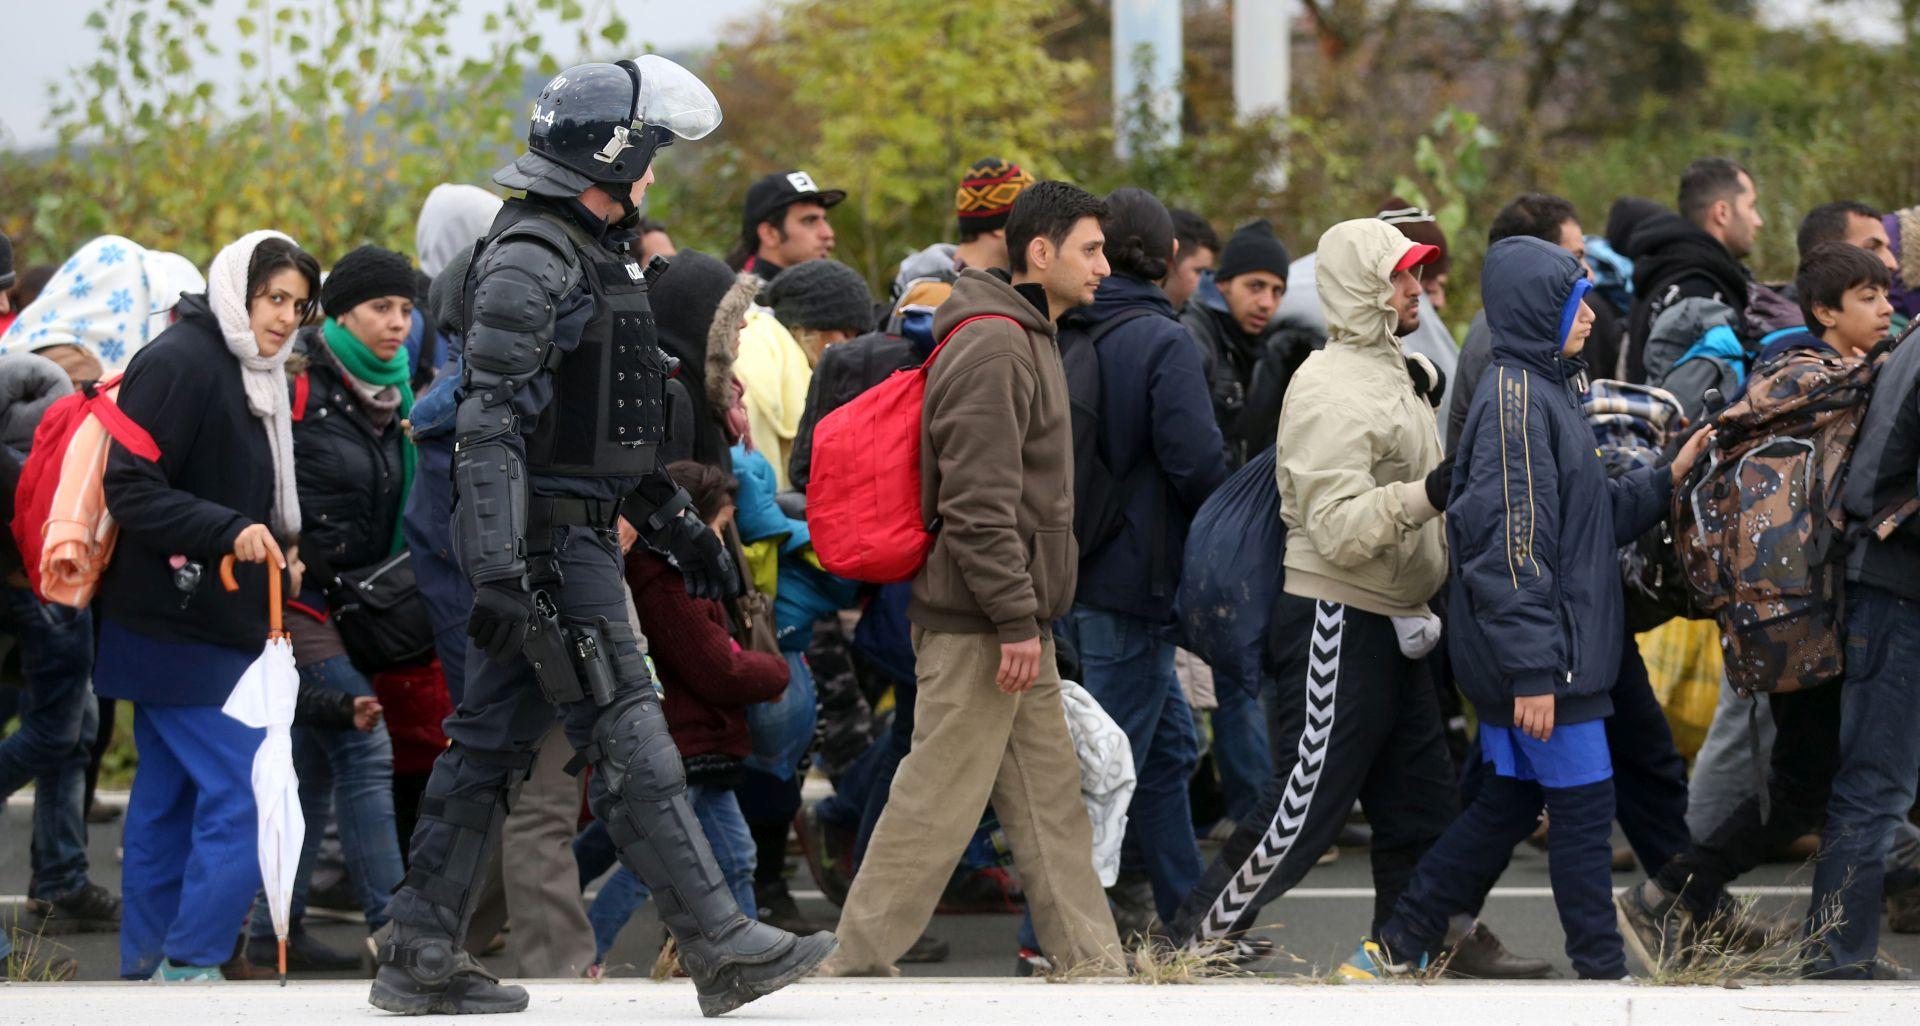 KRITIKE SUSJEDA Cerar: Hrvatska se ponaša neeuropski u migrantskoj krizi